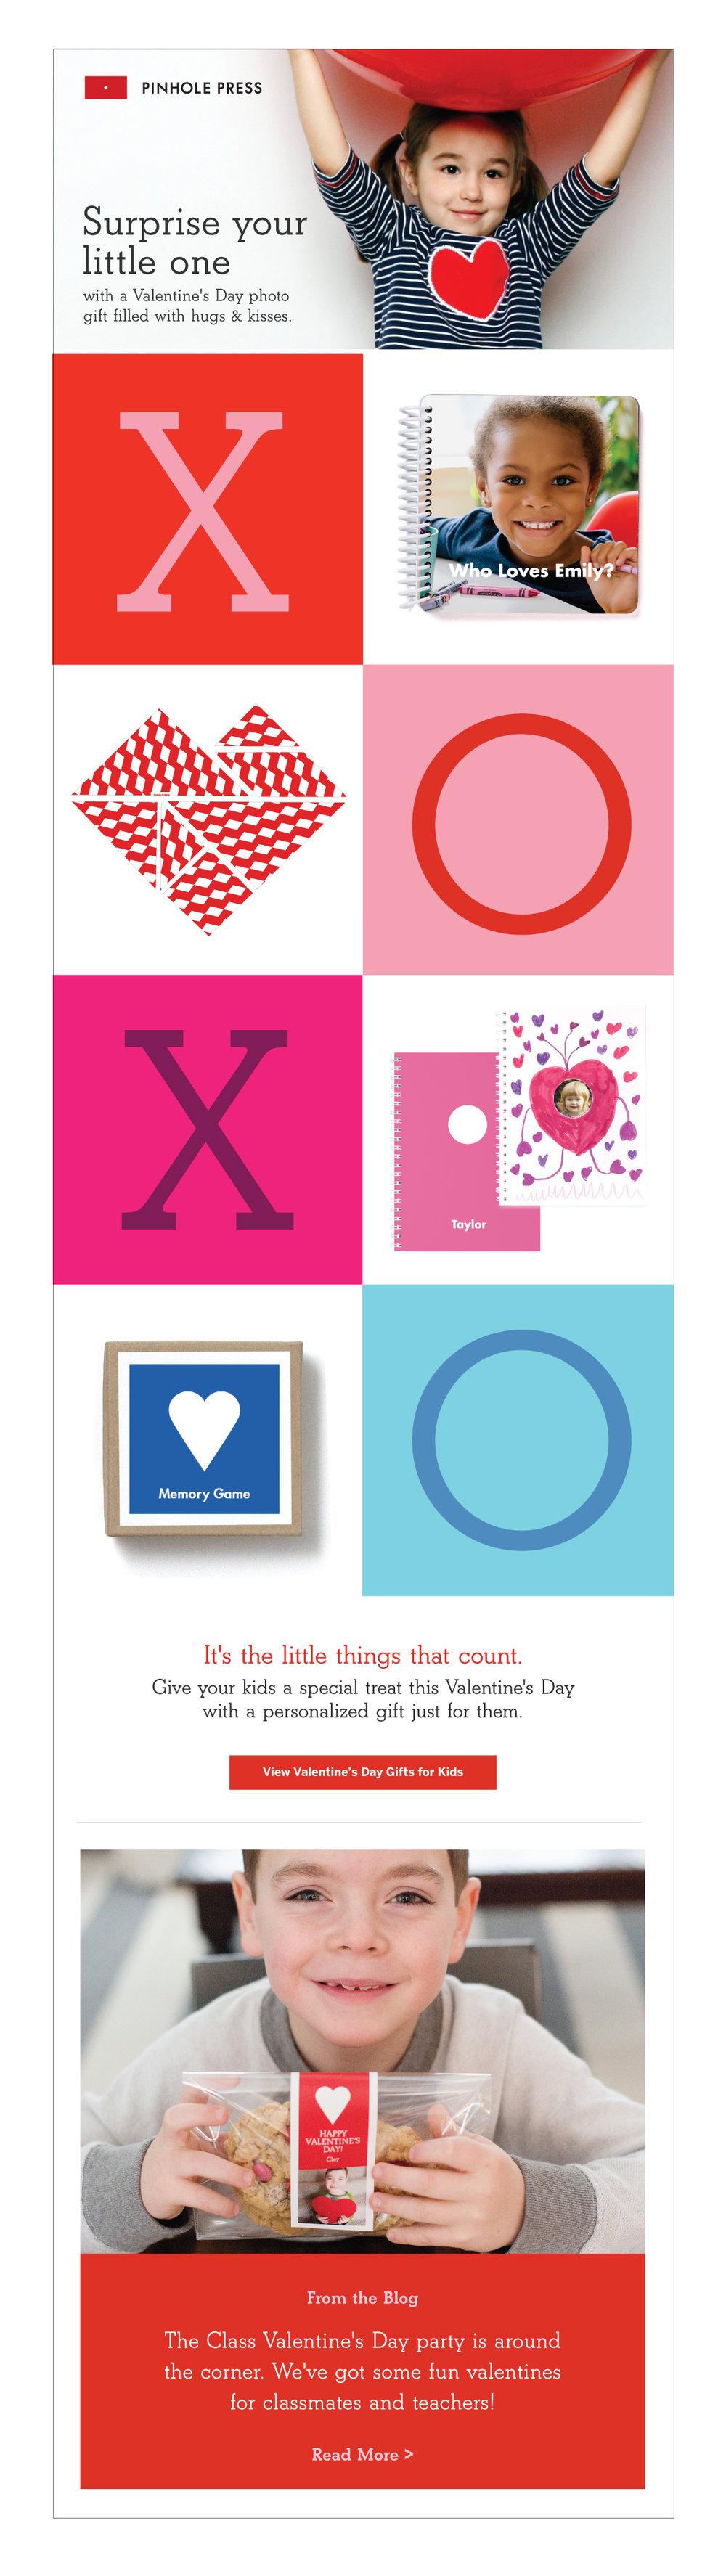 PinholePress-ValentinesDayGiftforKids.jpg